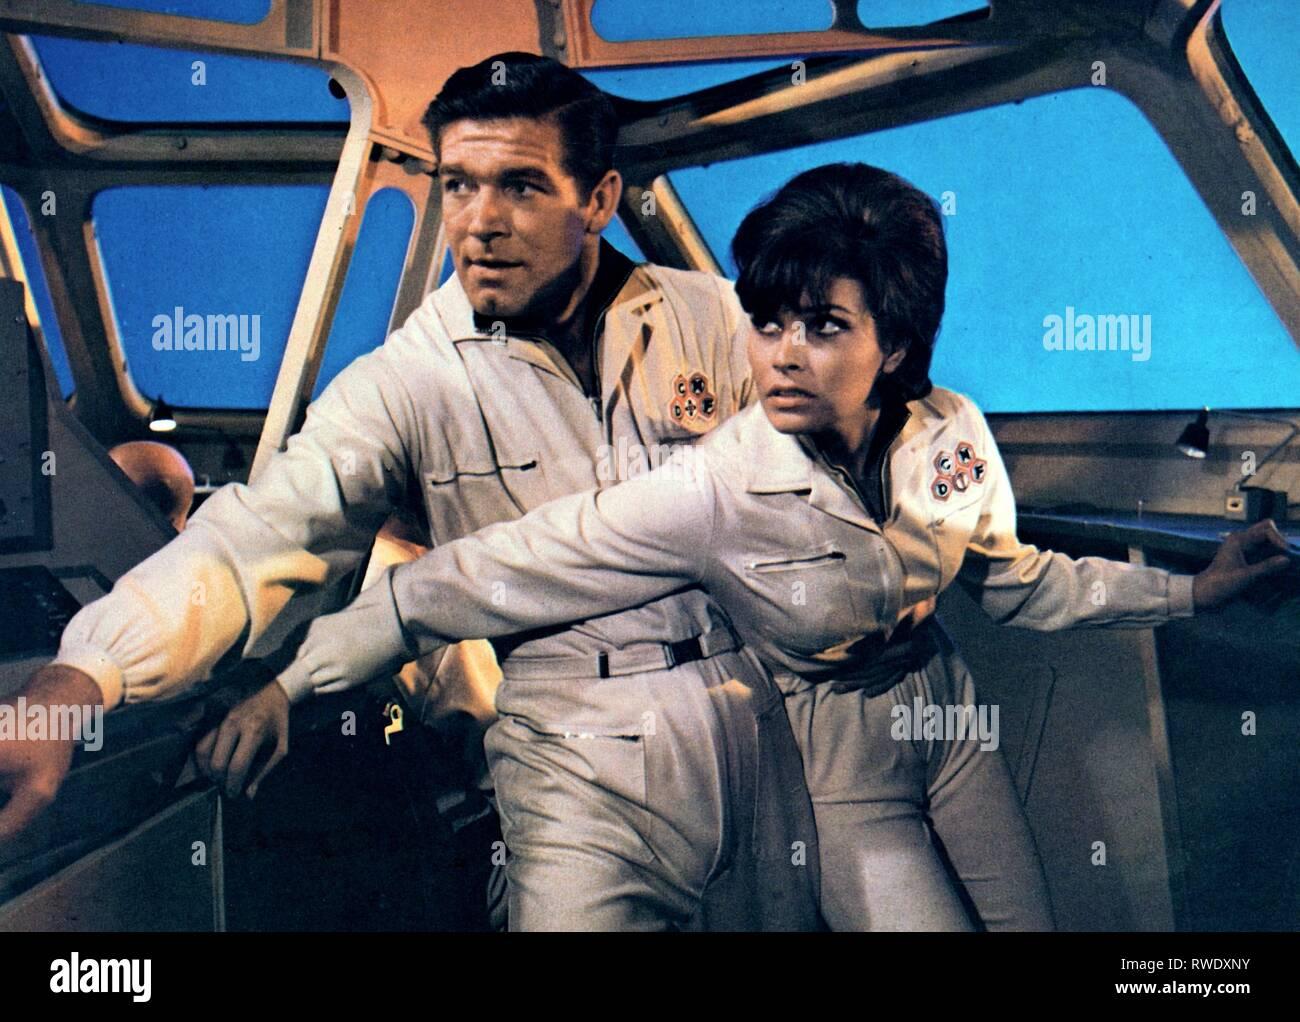 BOYD,WELCH, voyage fantastique, 1966 Photo Stock